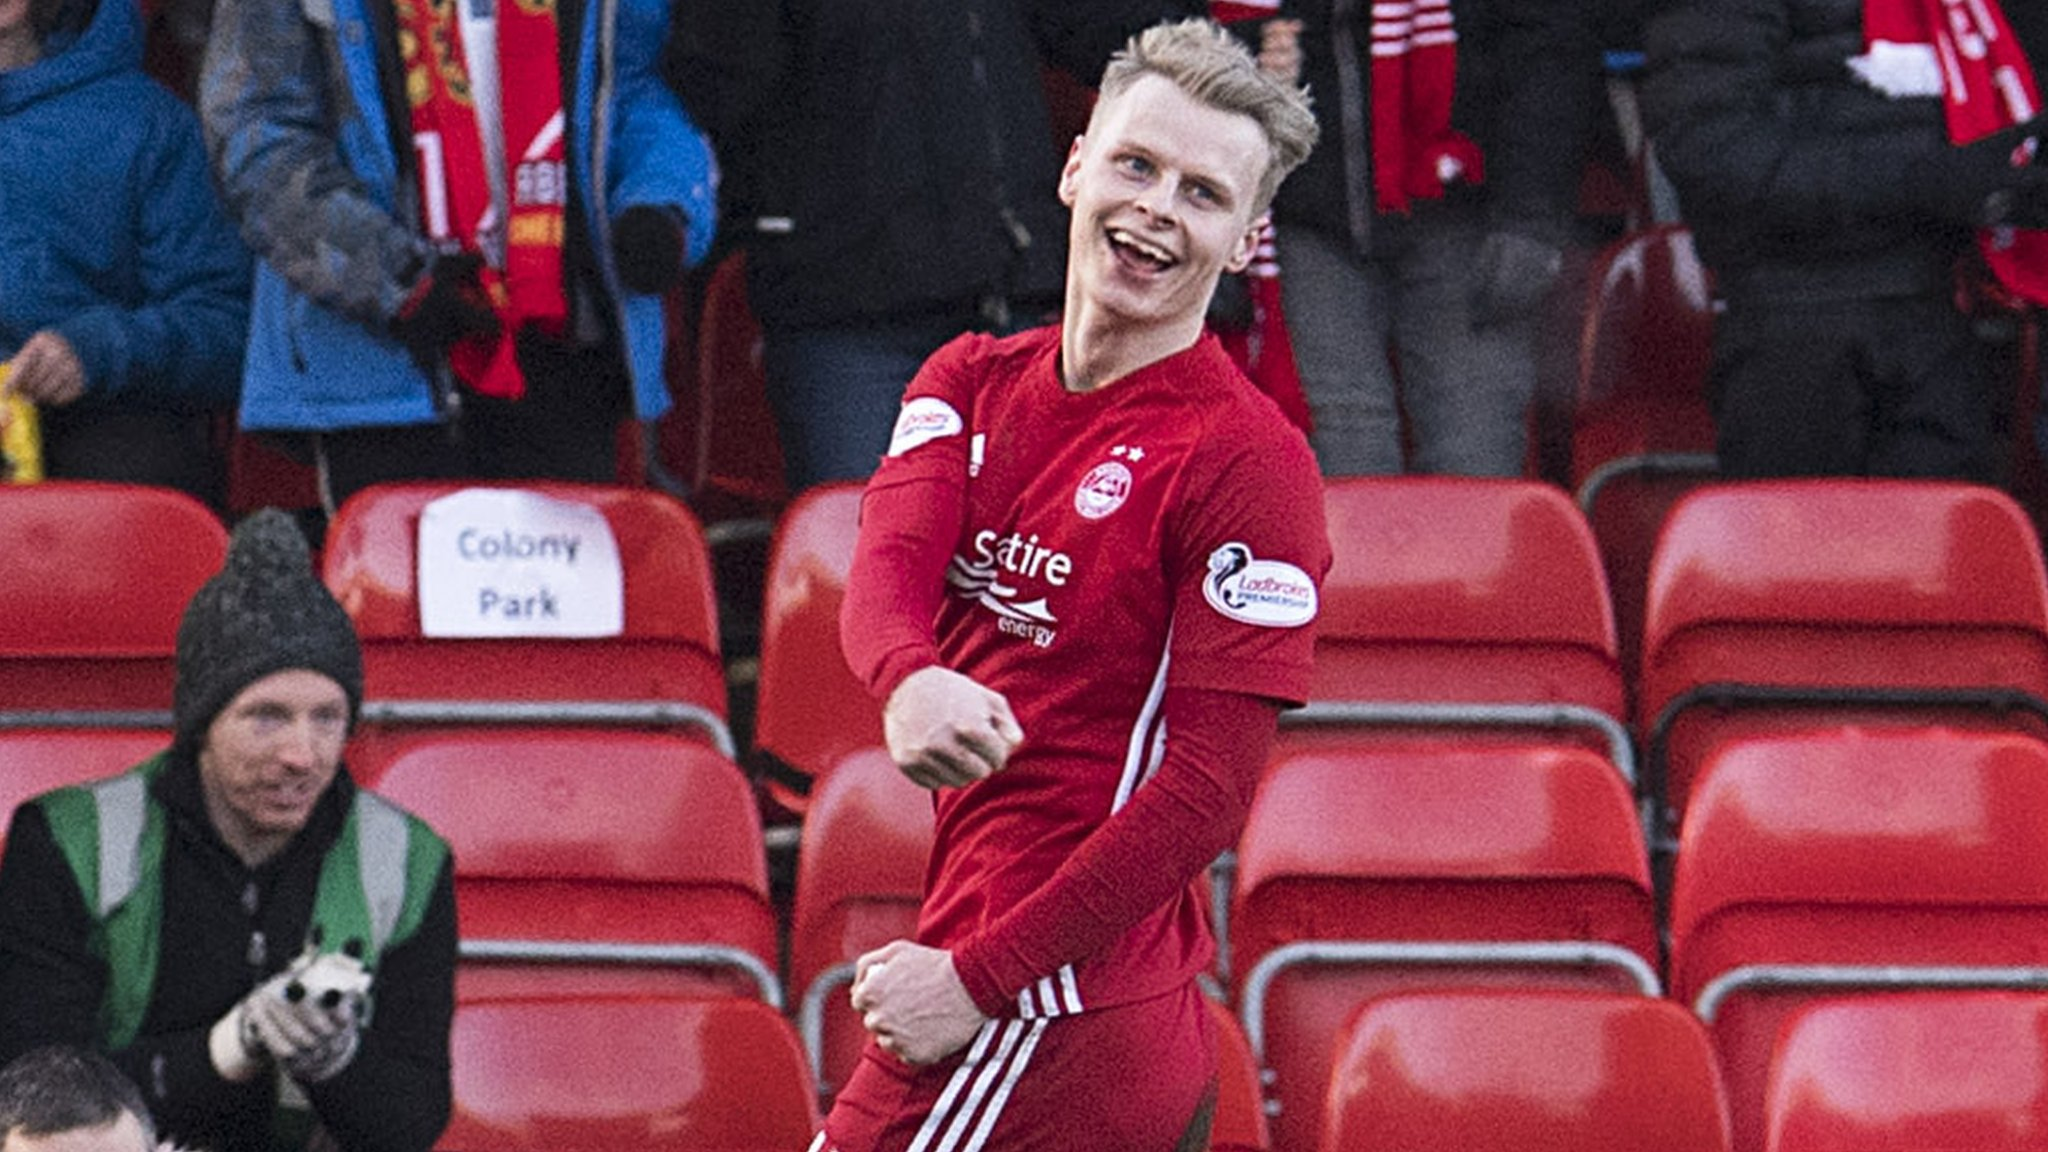 Mackay-Steven hat-trick as Aberdeen see off Hibs